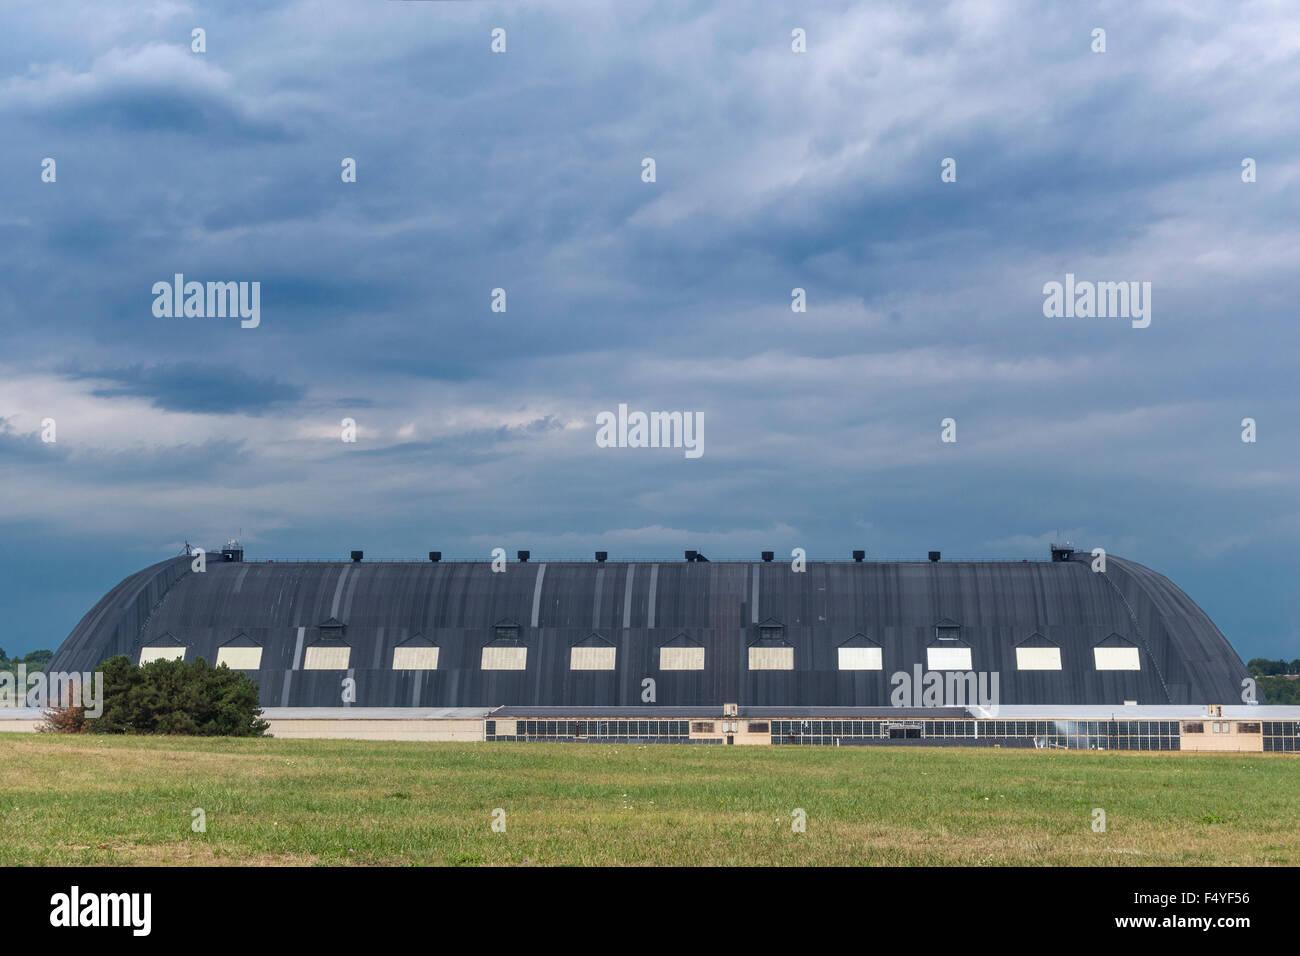 Akron Ohio Blimp Hangar originally Goodyear Zeppelin Airdock, now owned by Lockheed Martin. - Stock Image